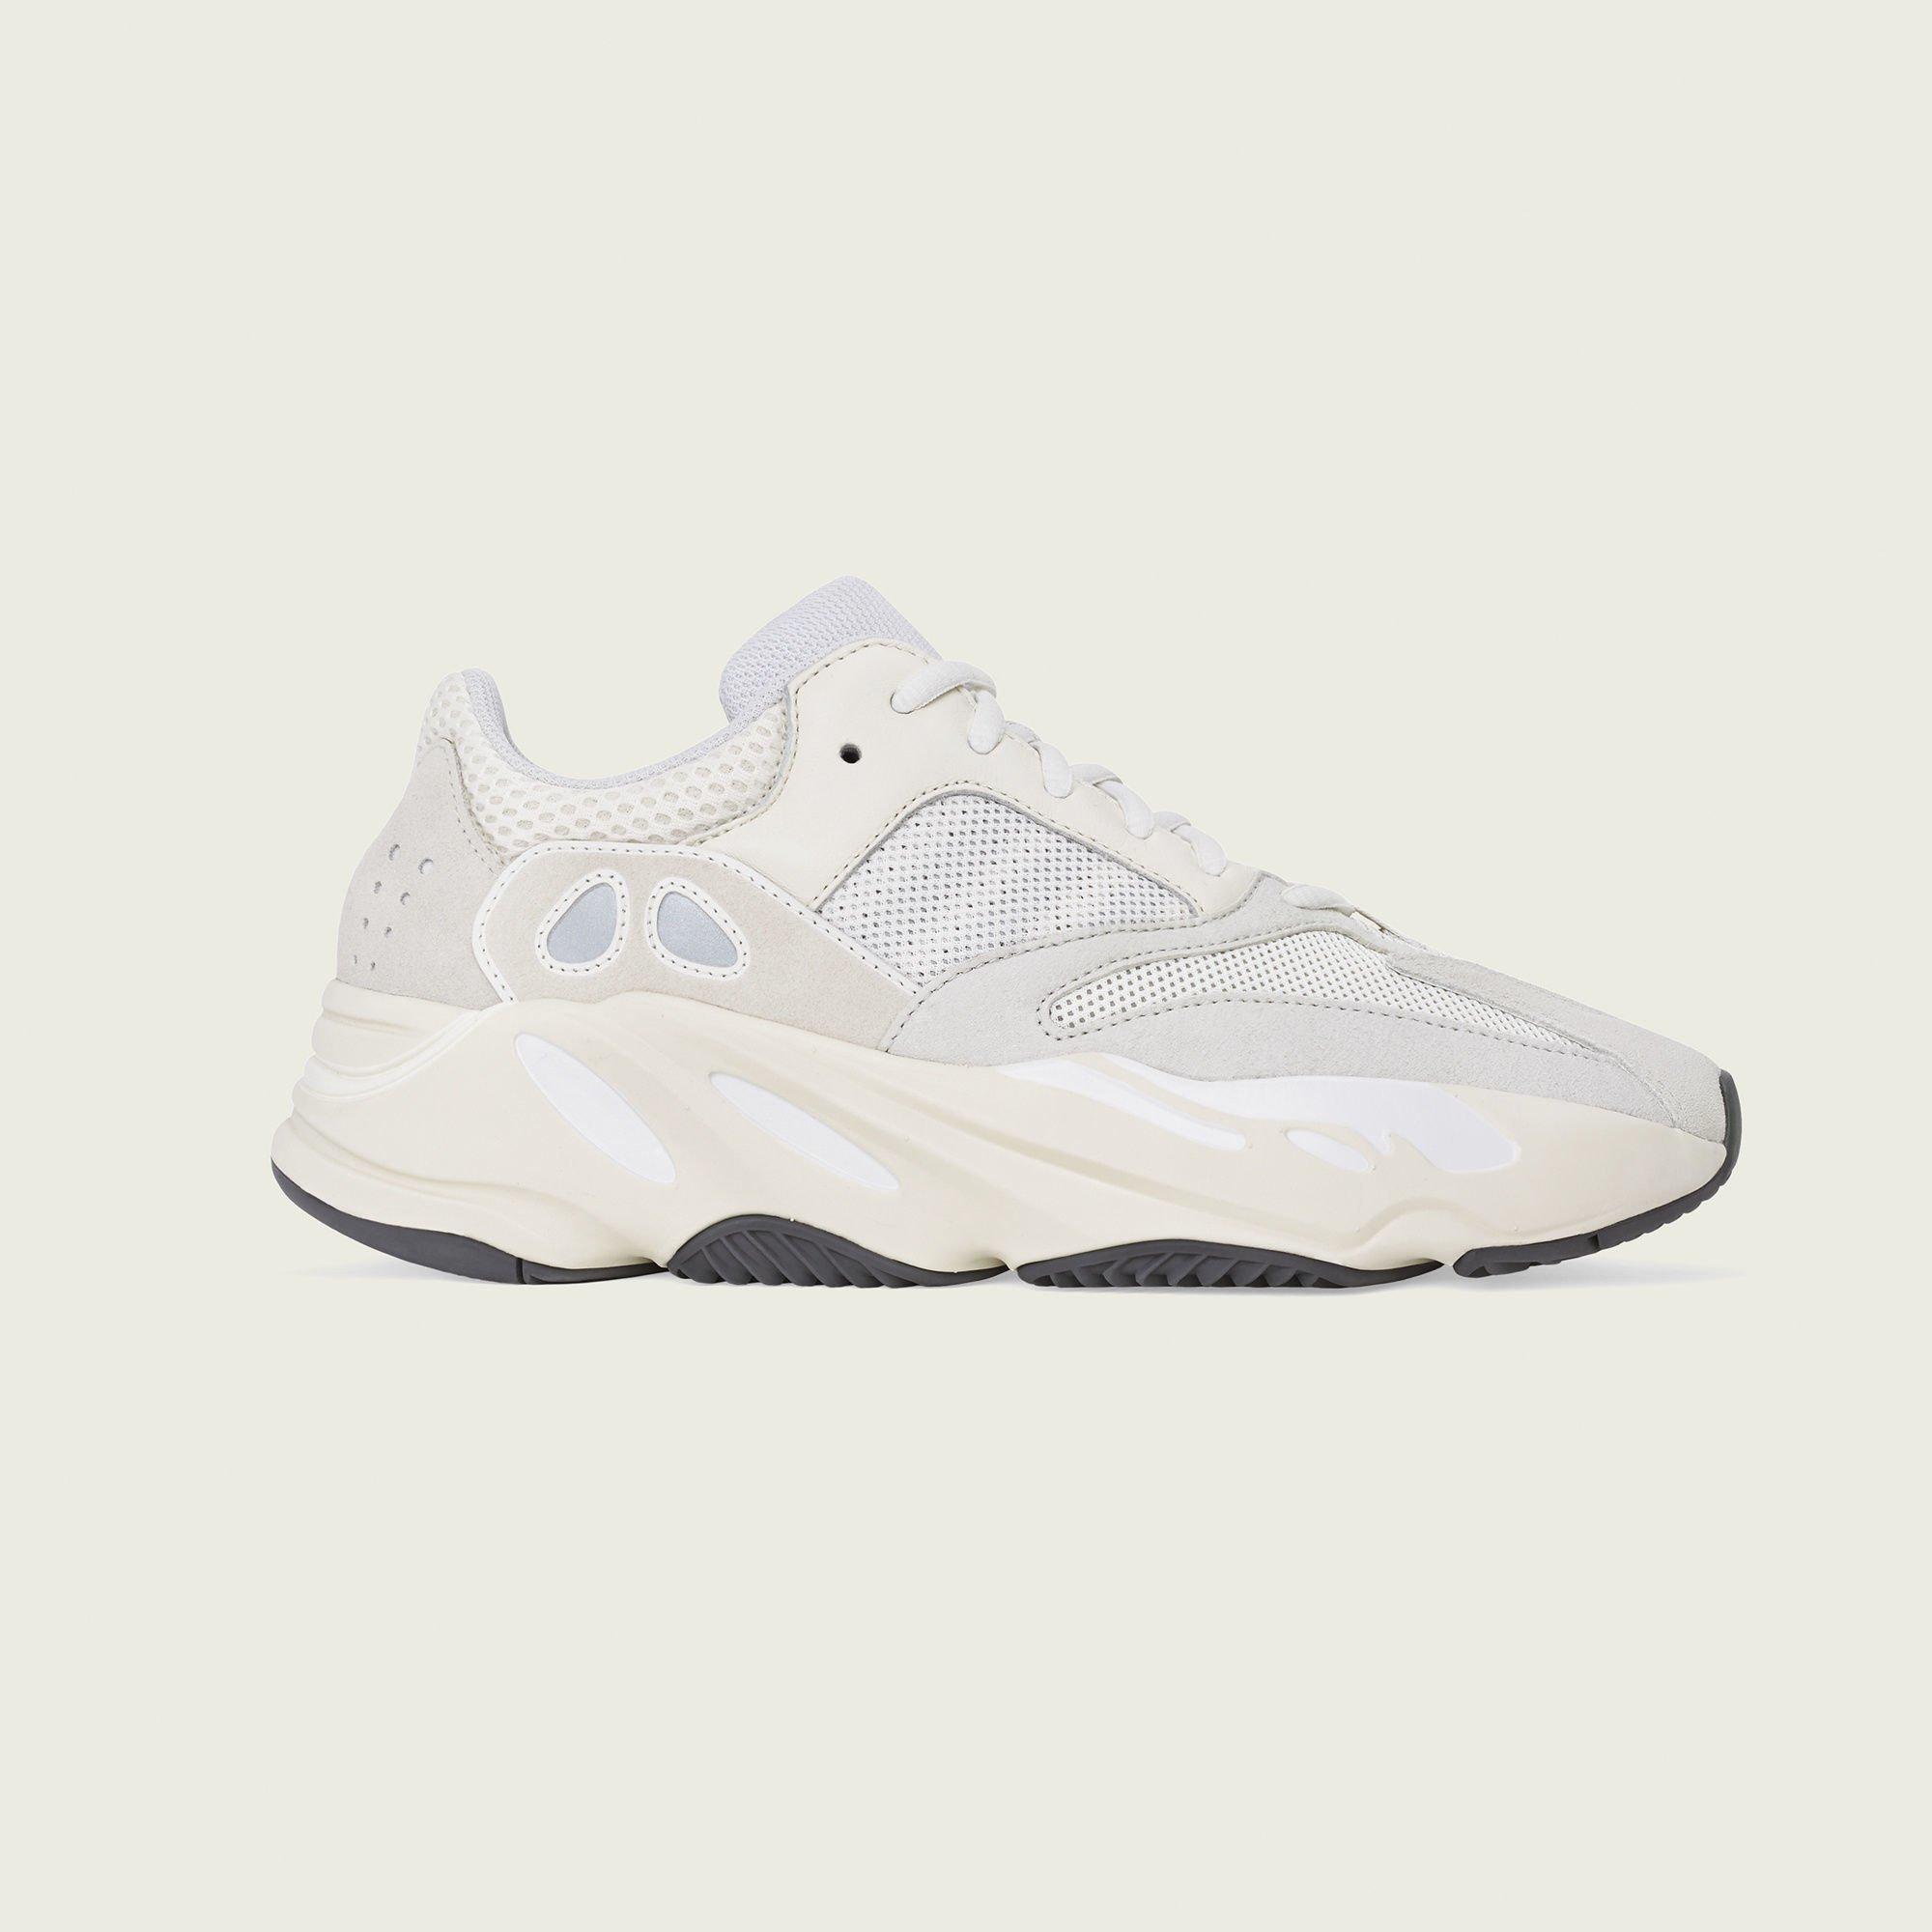 Adidas YEEZY BOOST 700 ANALOG (EG7596)